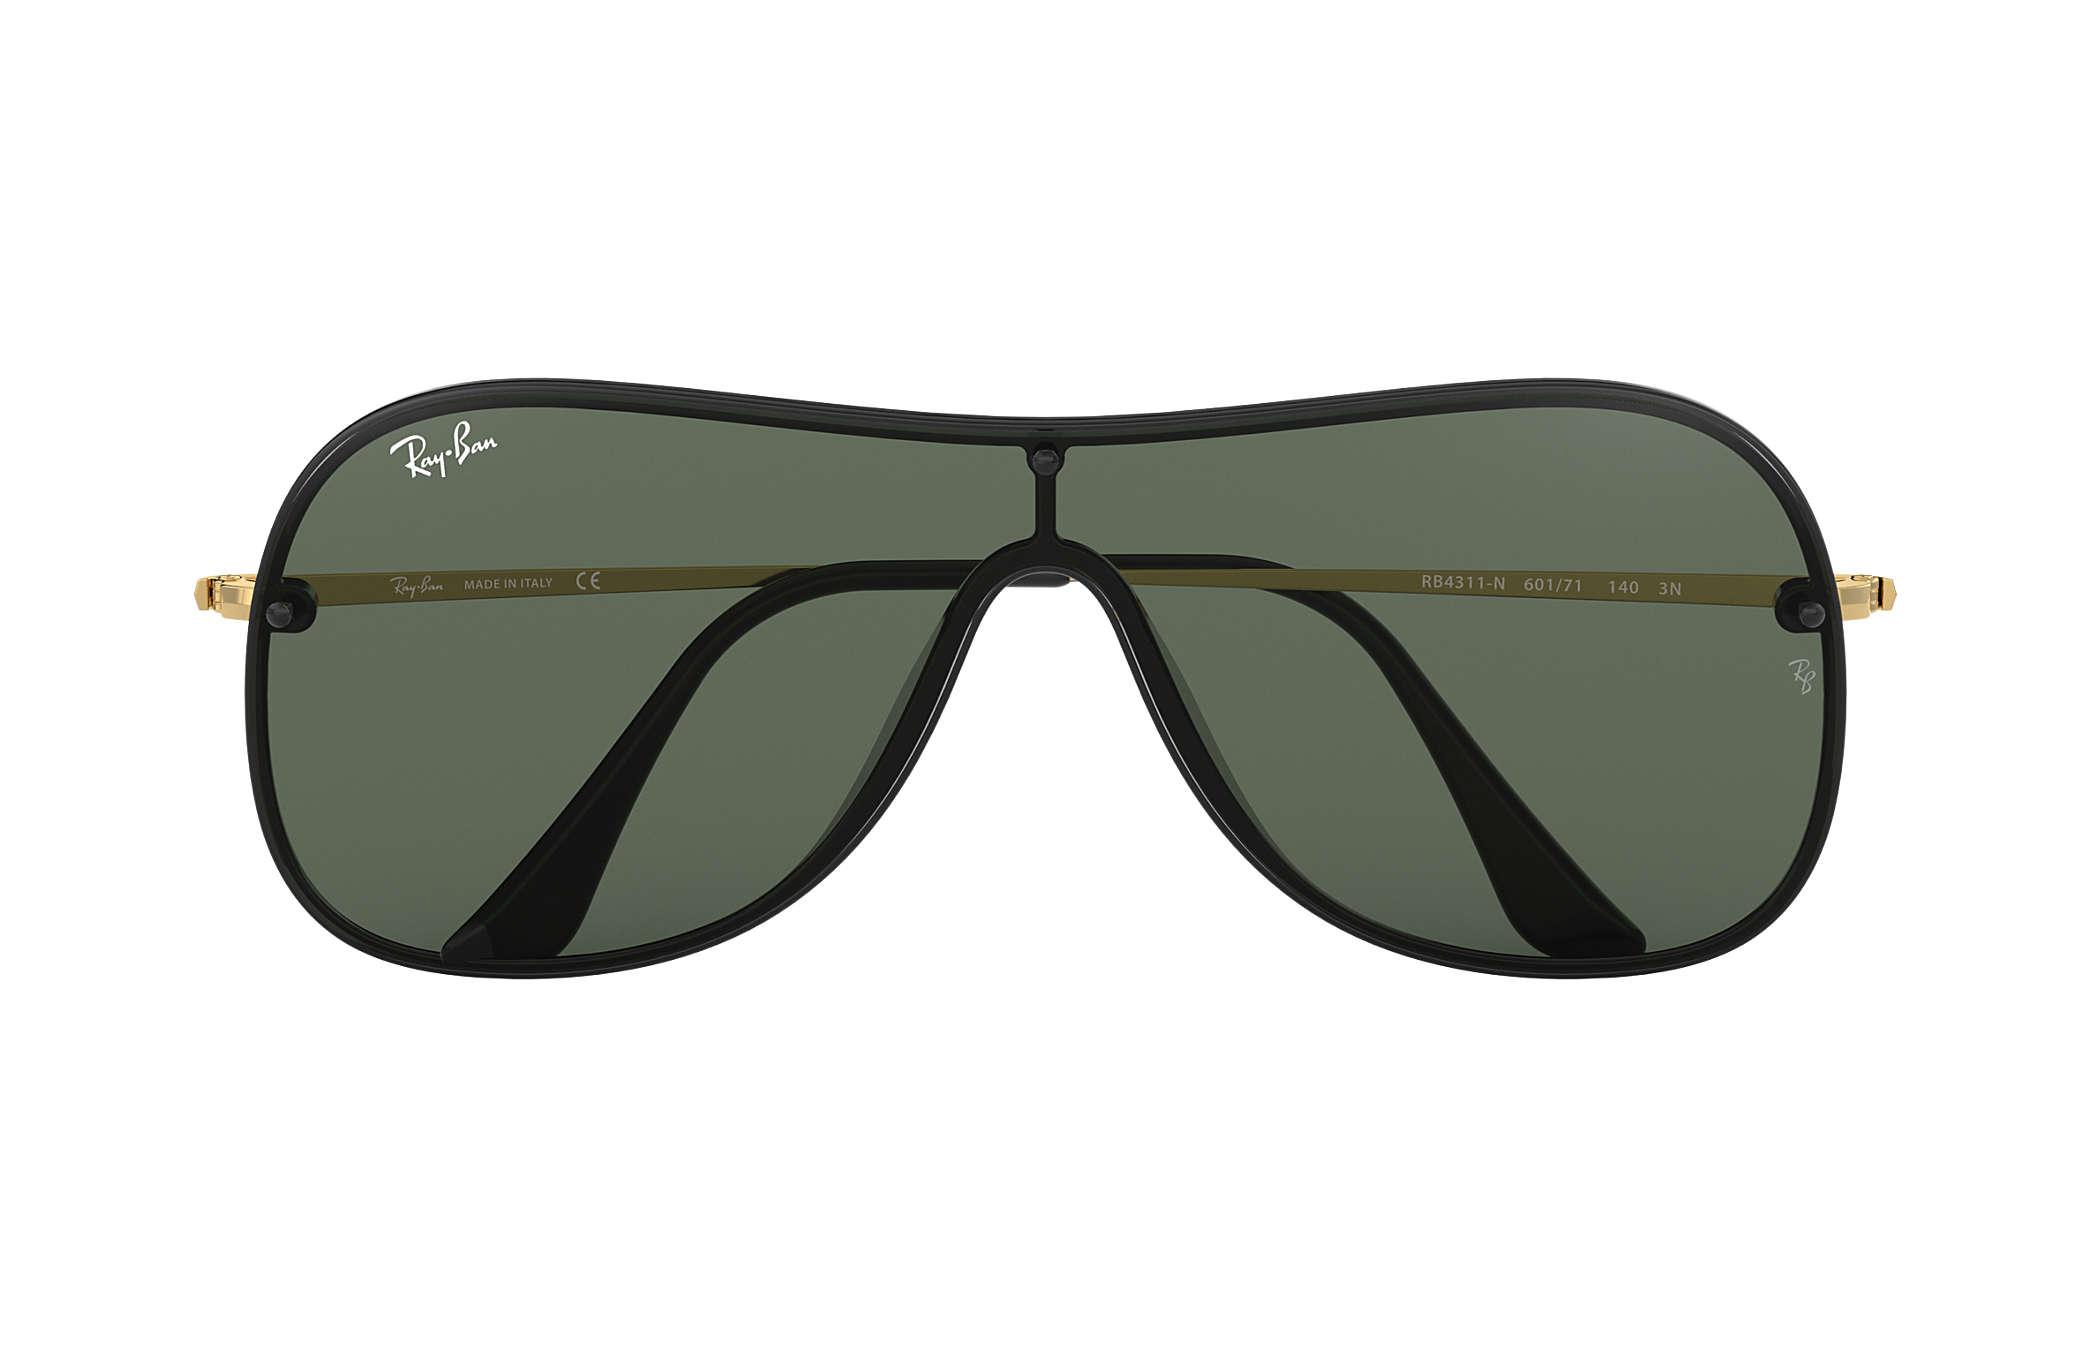 b4f93db22e Ray-Ban RB4311N Black - Nylon - Green Lenses - 0RB4311N601 7138 ...